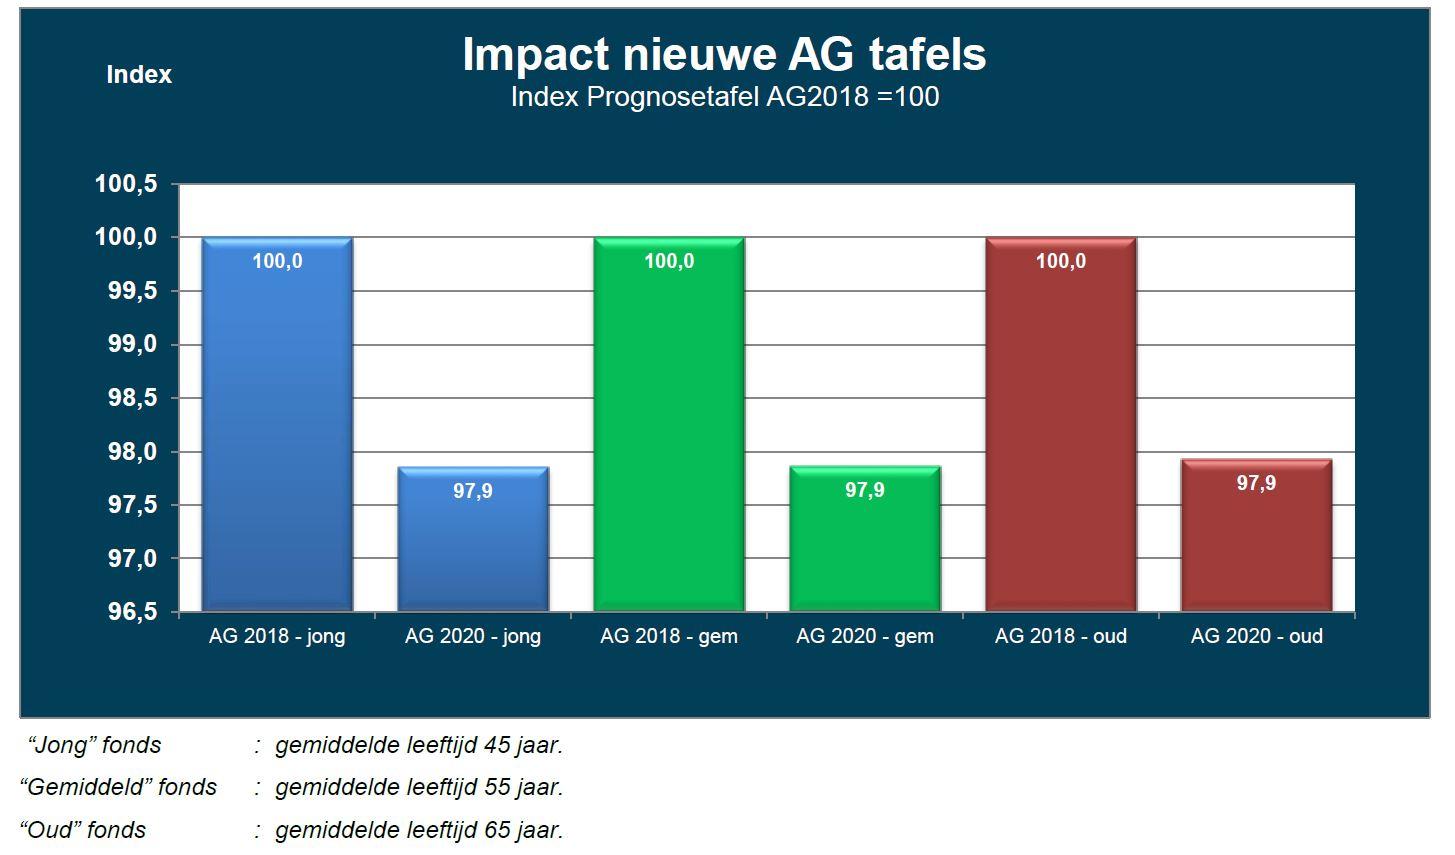 AG2020 nieuwe AG tafels, impact